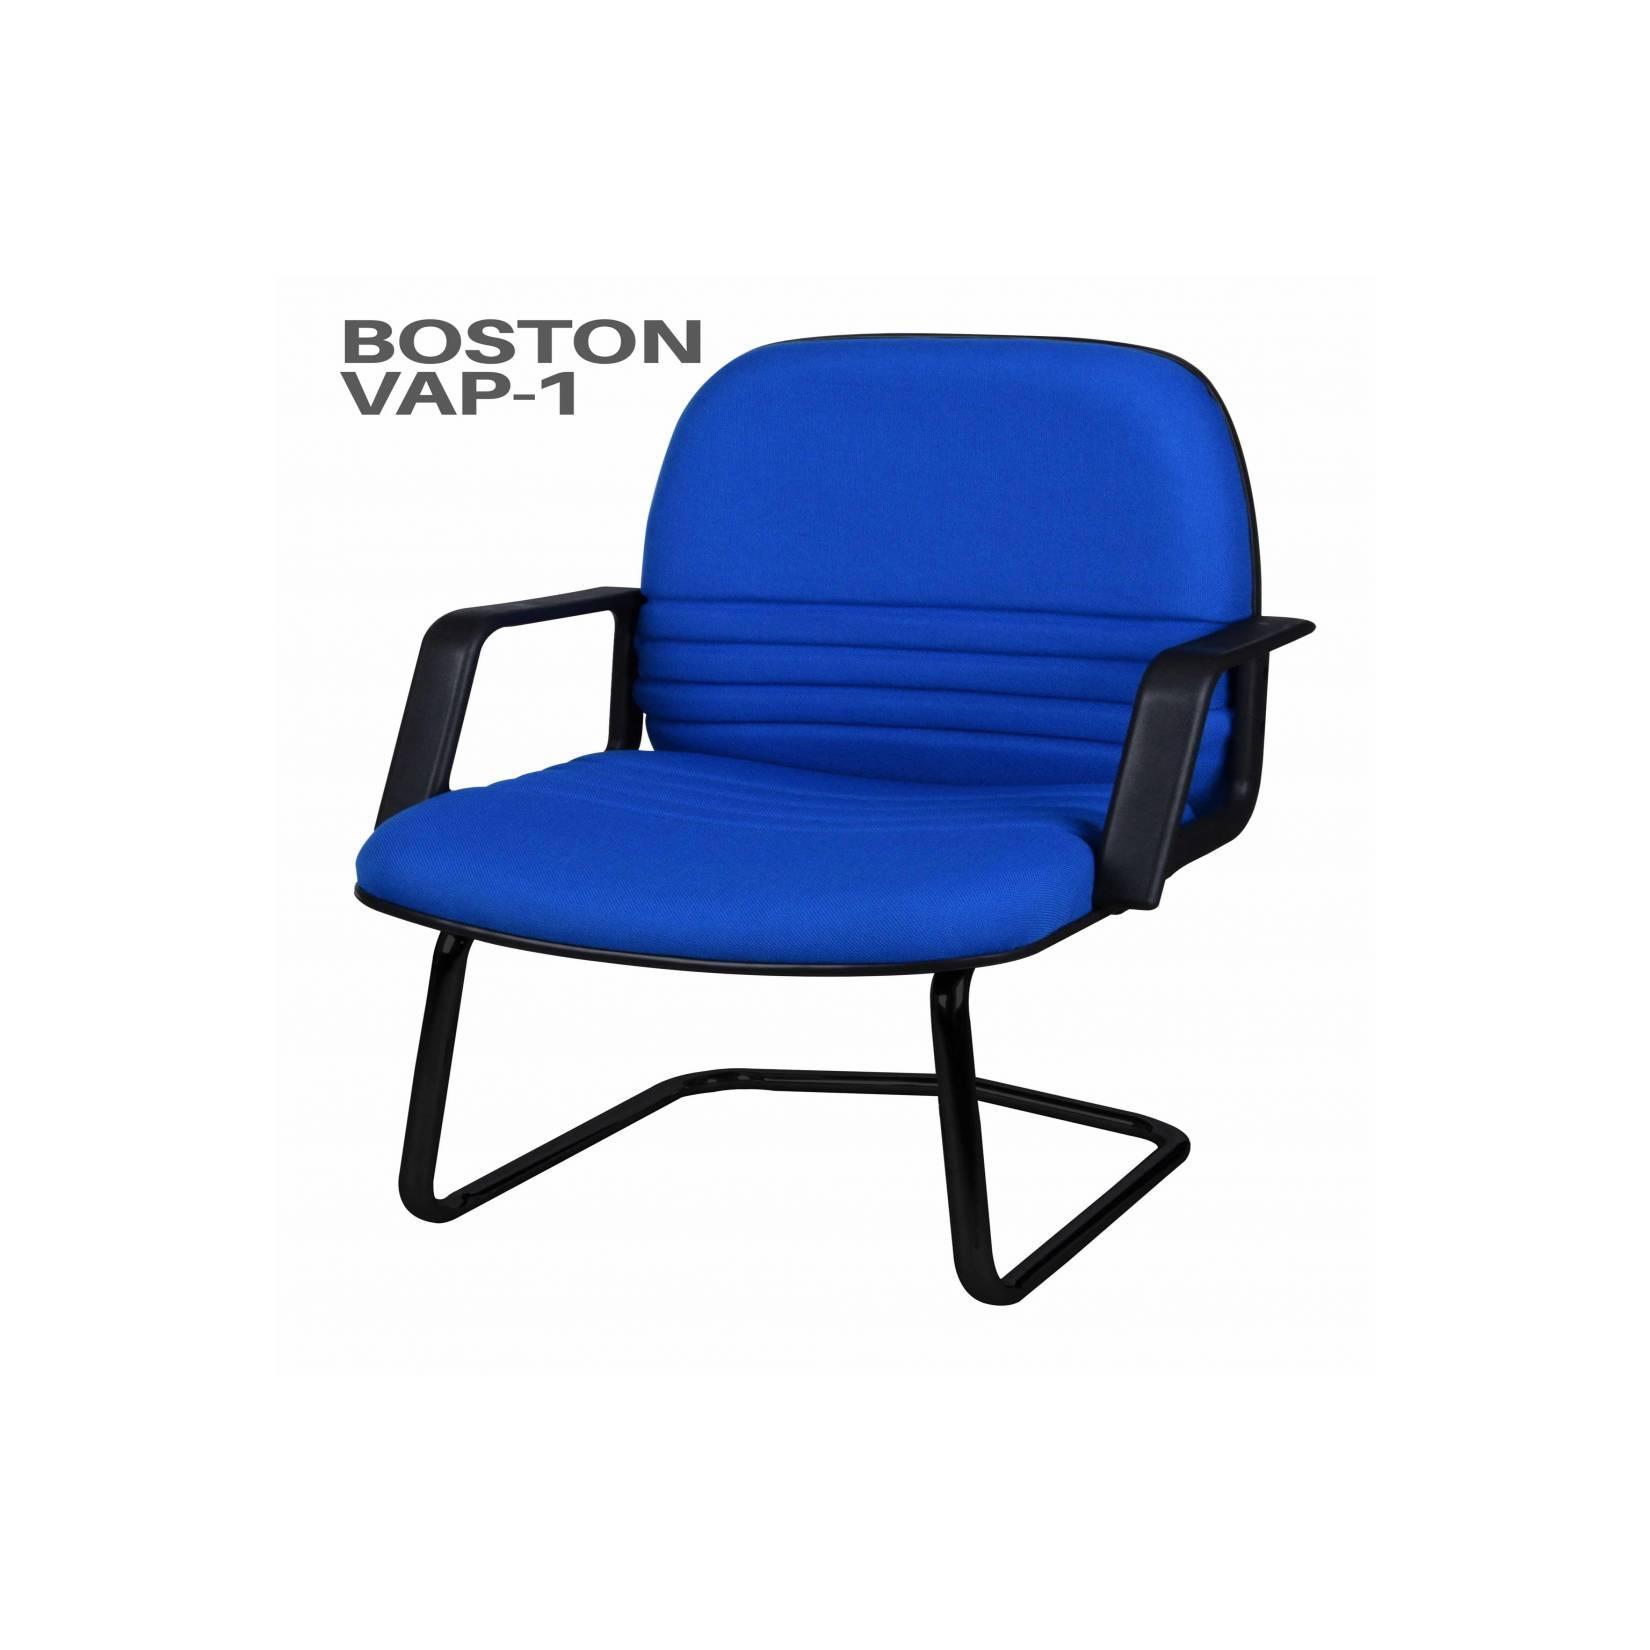 Kursi Hadap / Tamu Kantor Murah BOSTON VAP 1